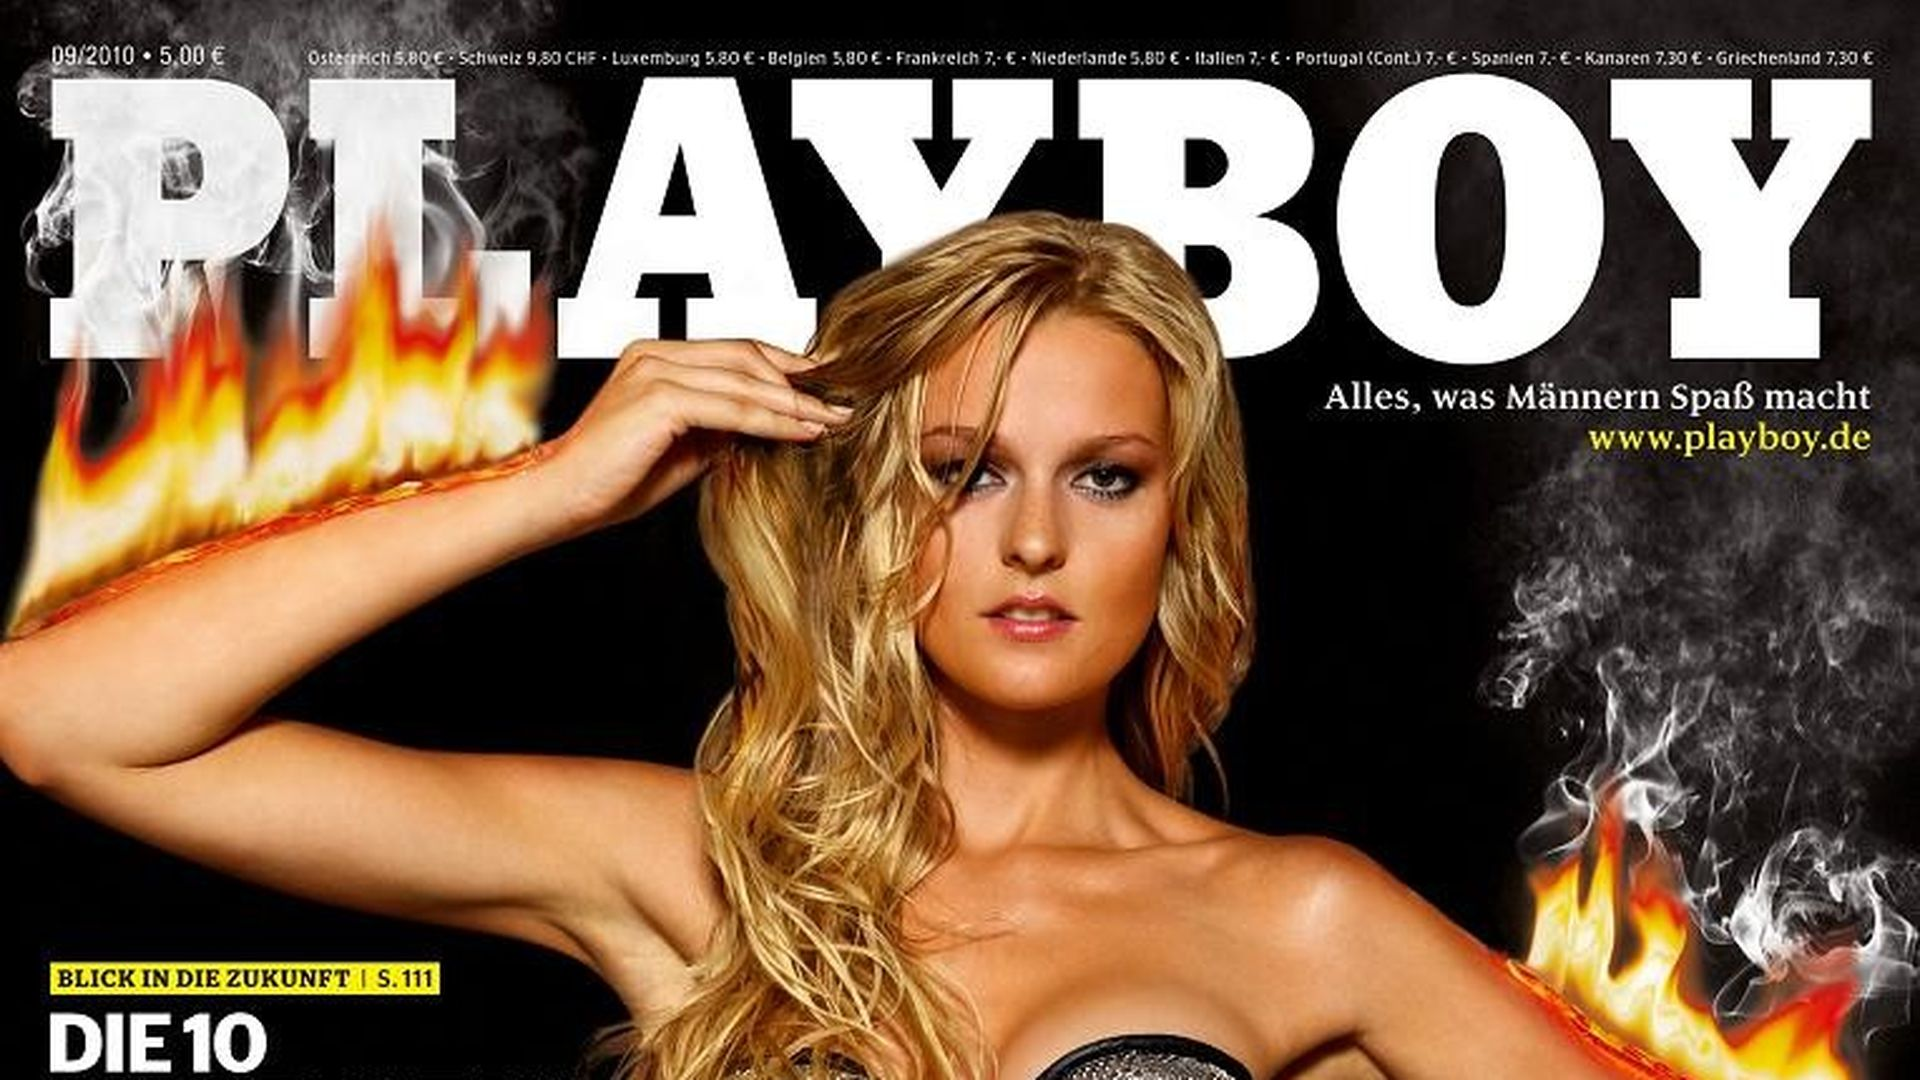 GNTM-Stuntfrau Miriam total heiß im Playboy | Promiflash.de